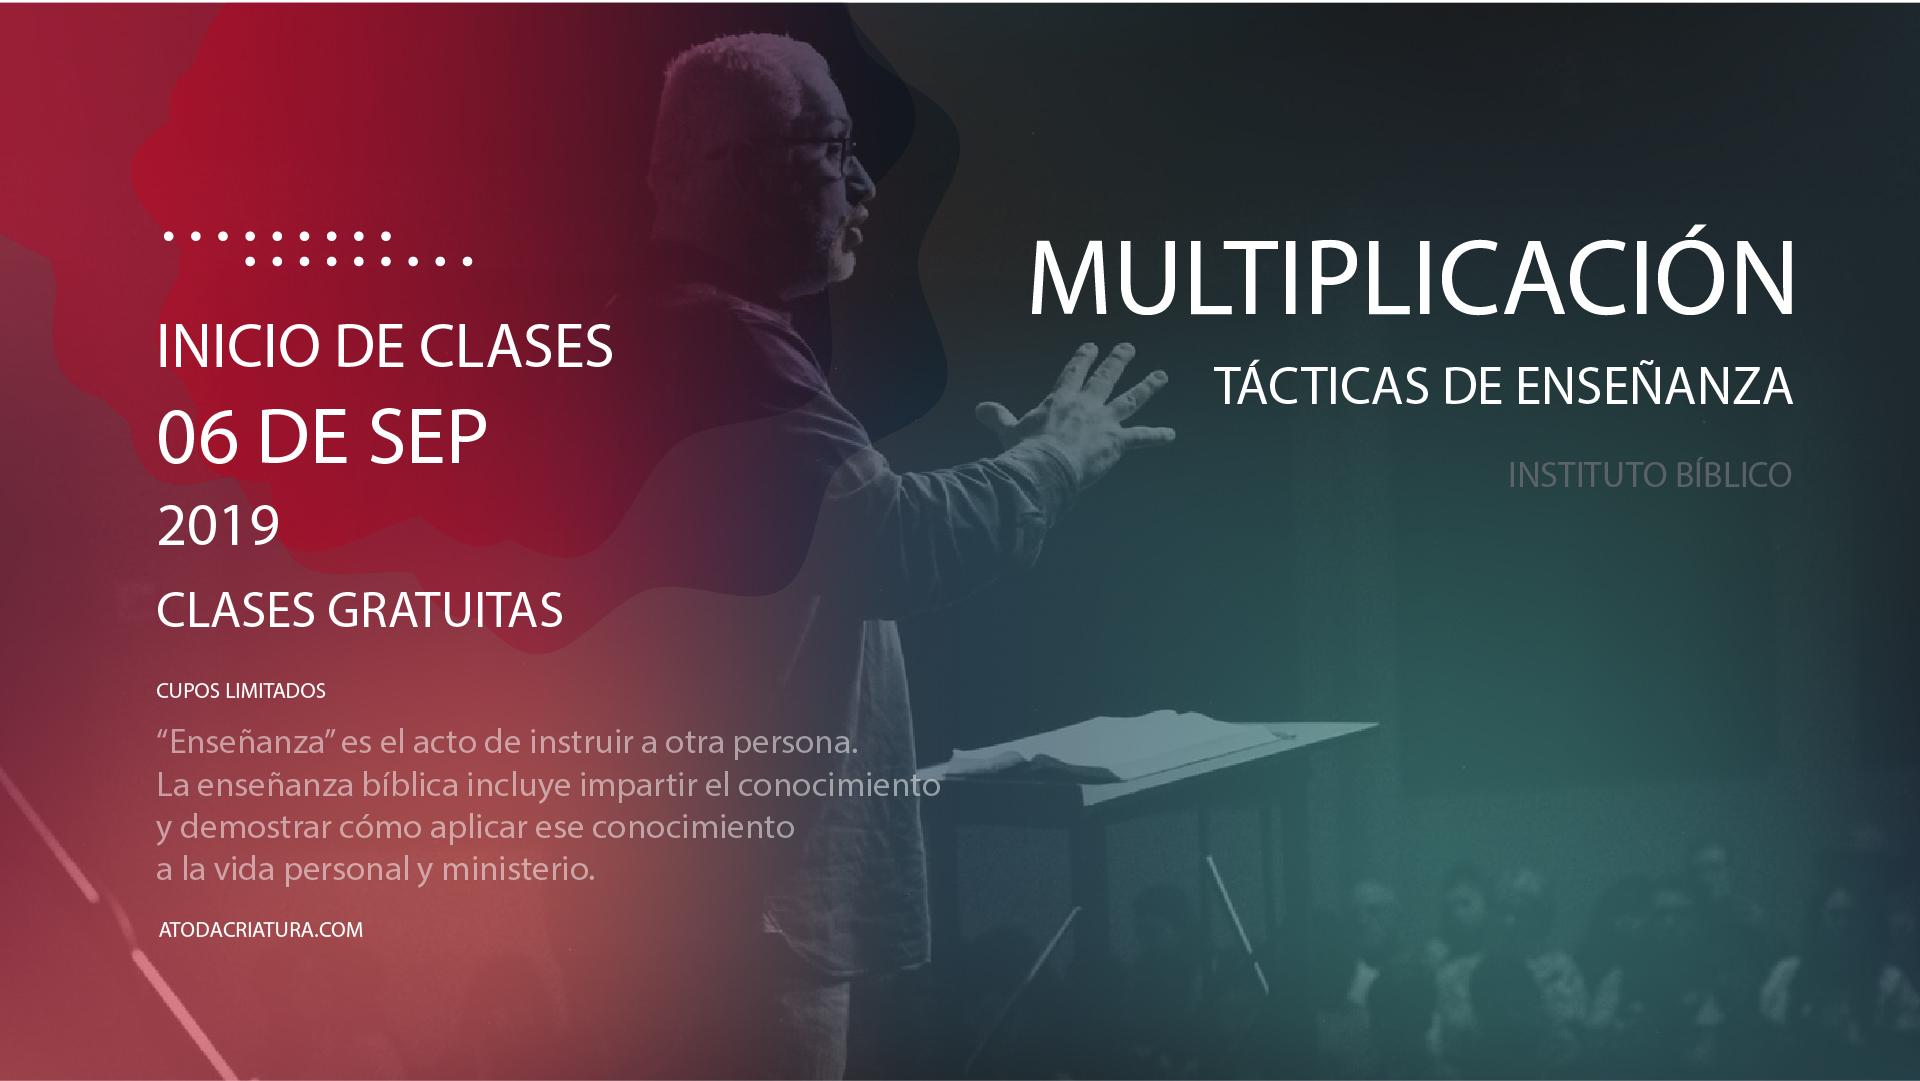 TACTICAS-DE-ENSEÑANZA-01